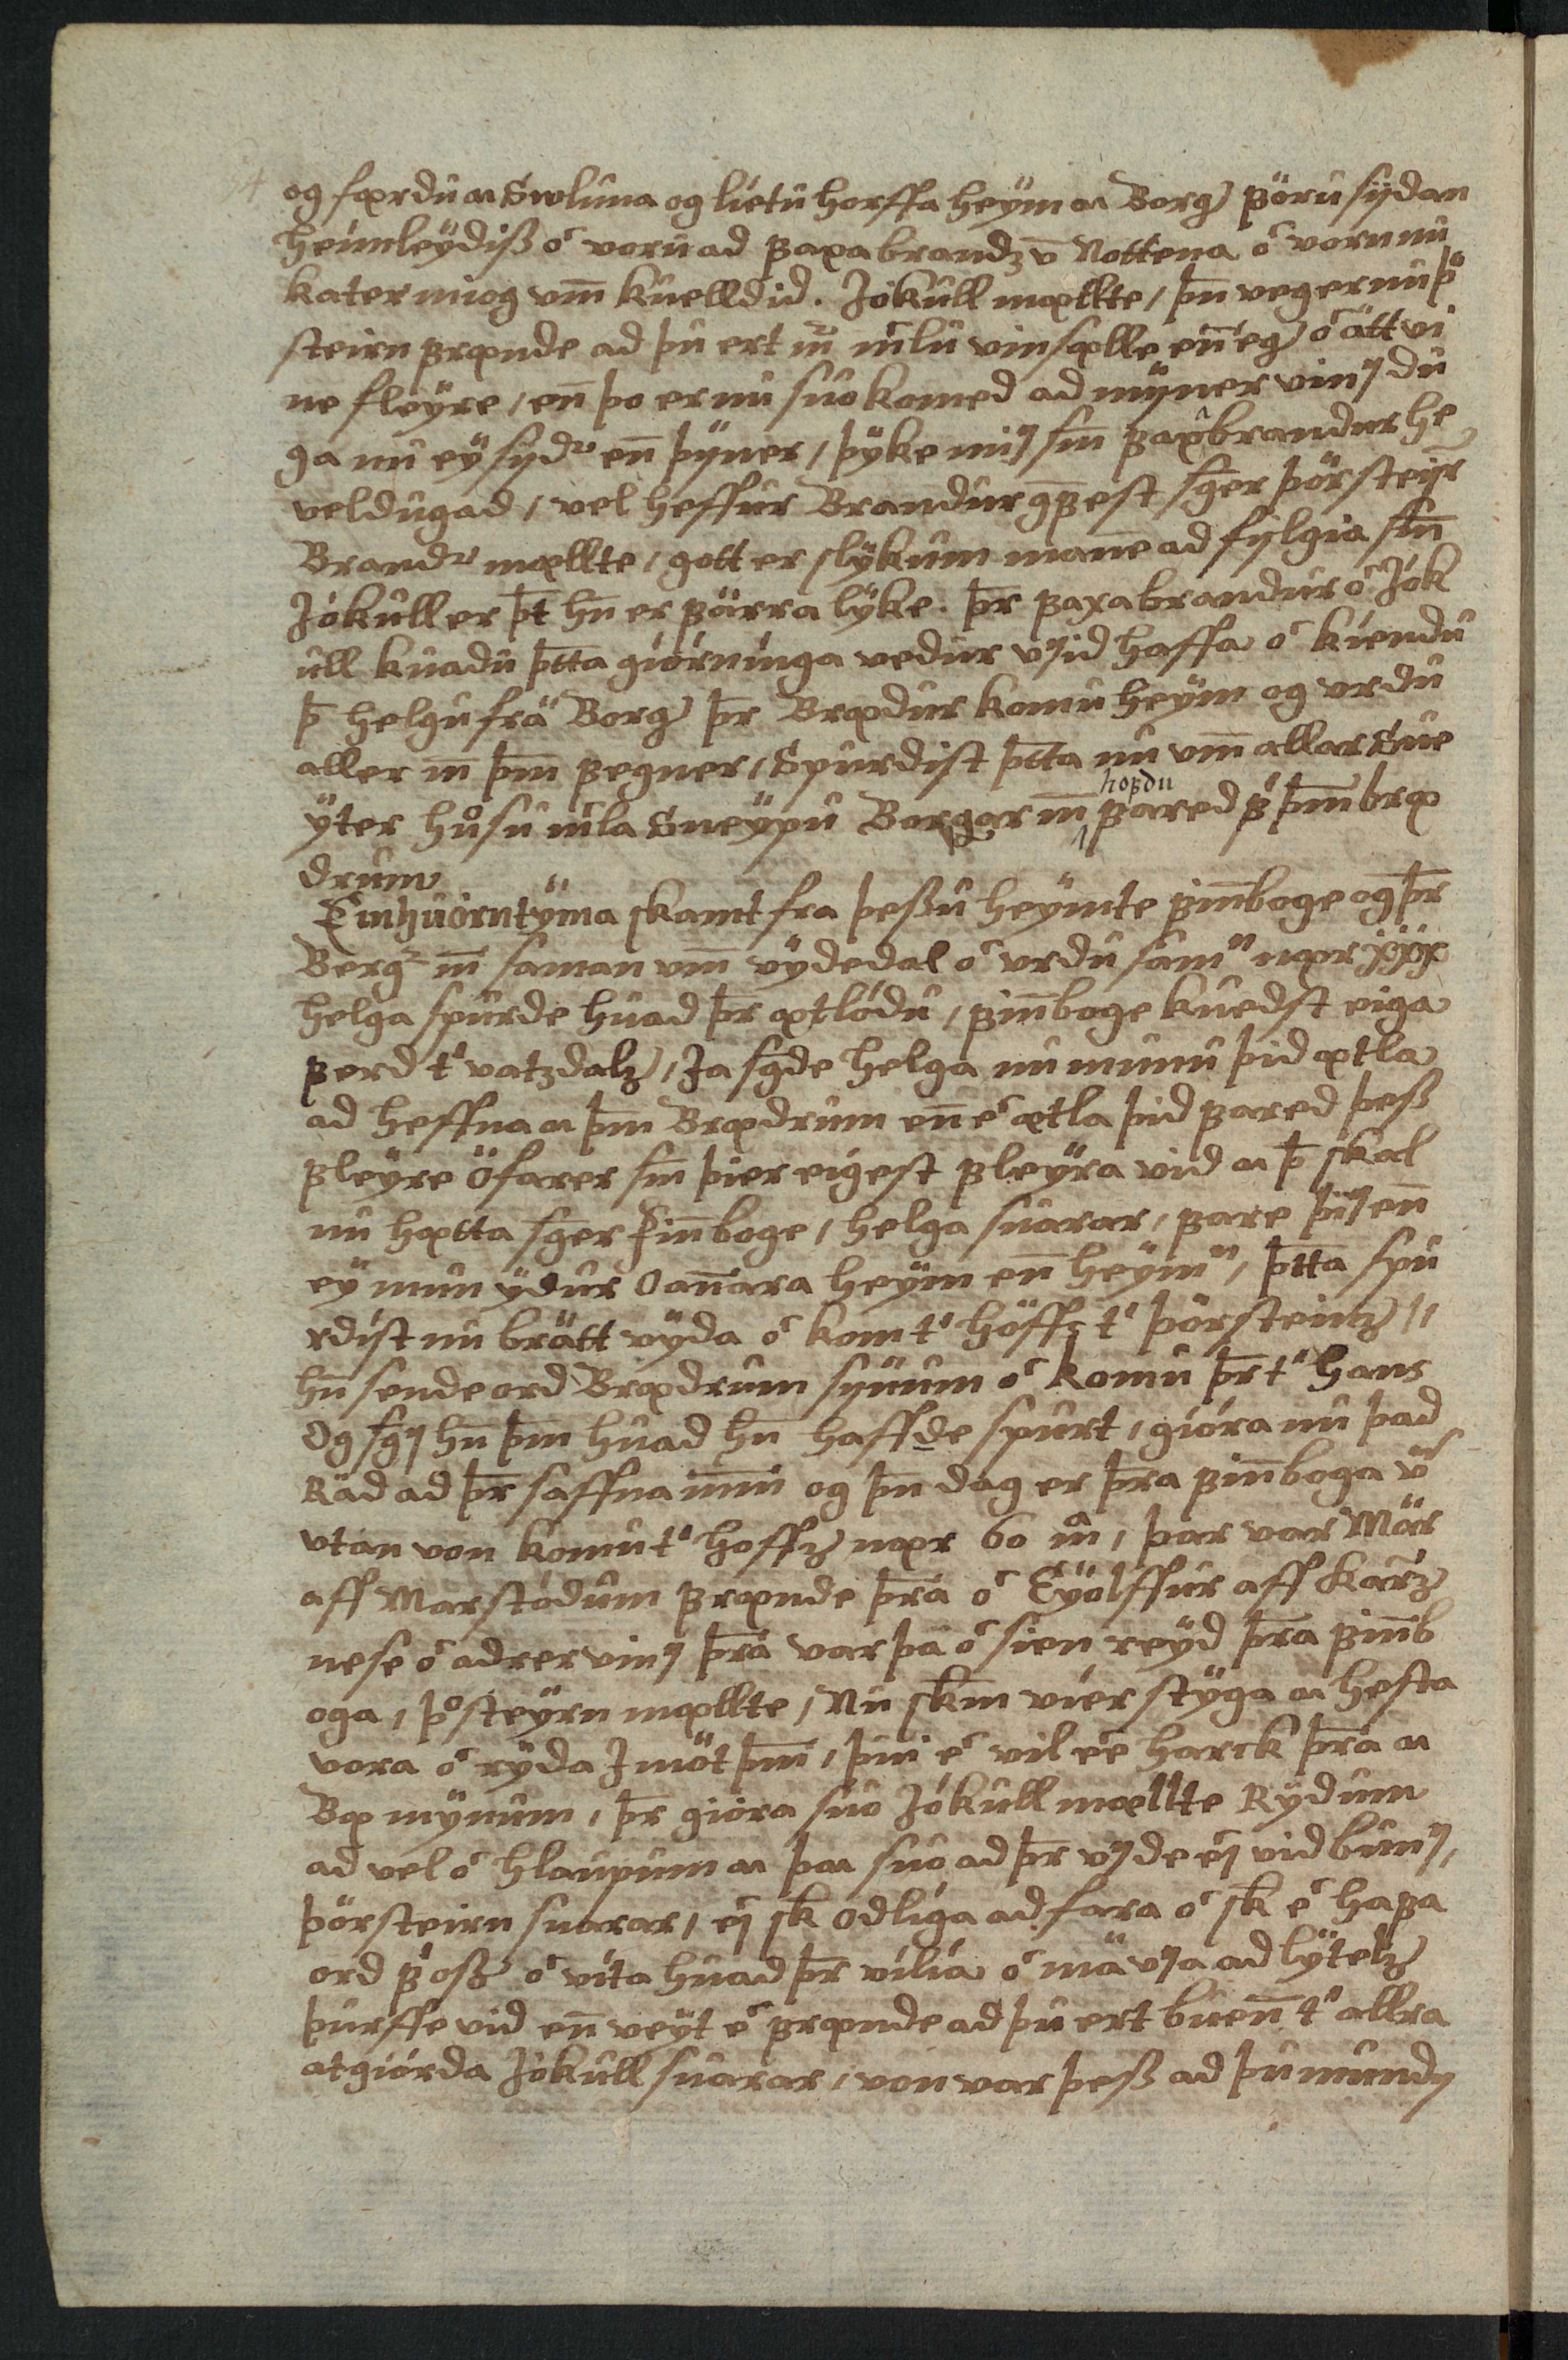 AM 138 fol - 27v